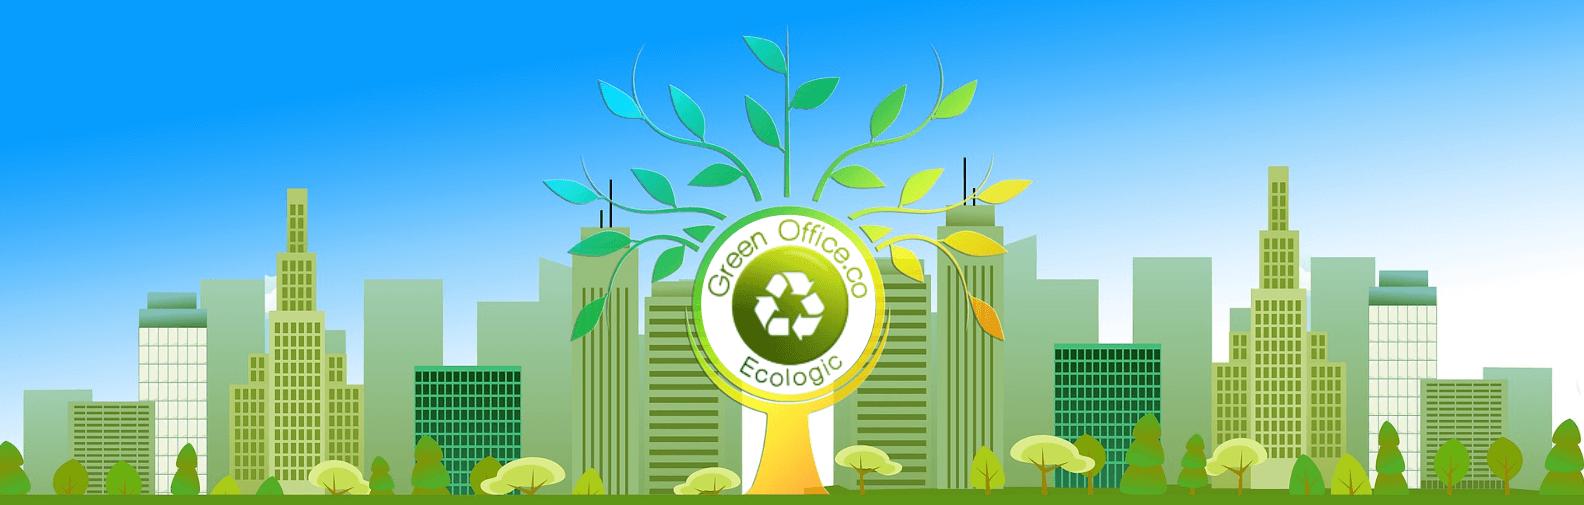 Green Office Ecologic Sp. z o.o.